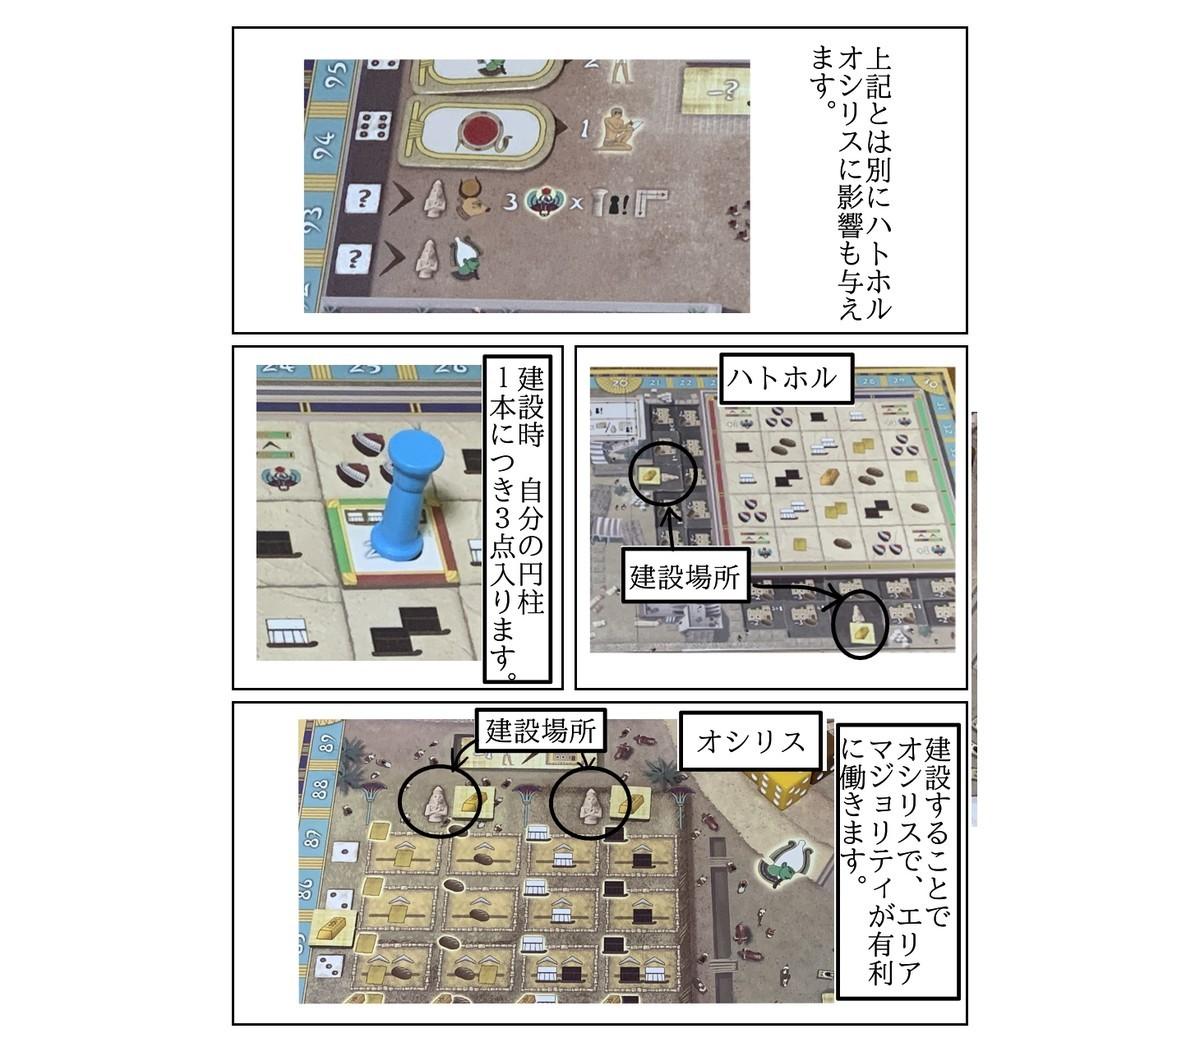 f:id:toratoranotora:20210522110212j:plain